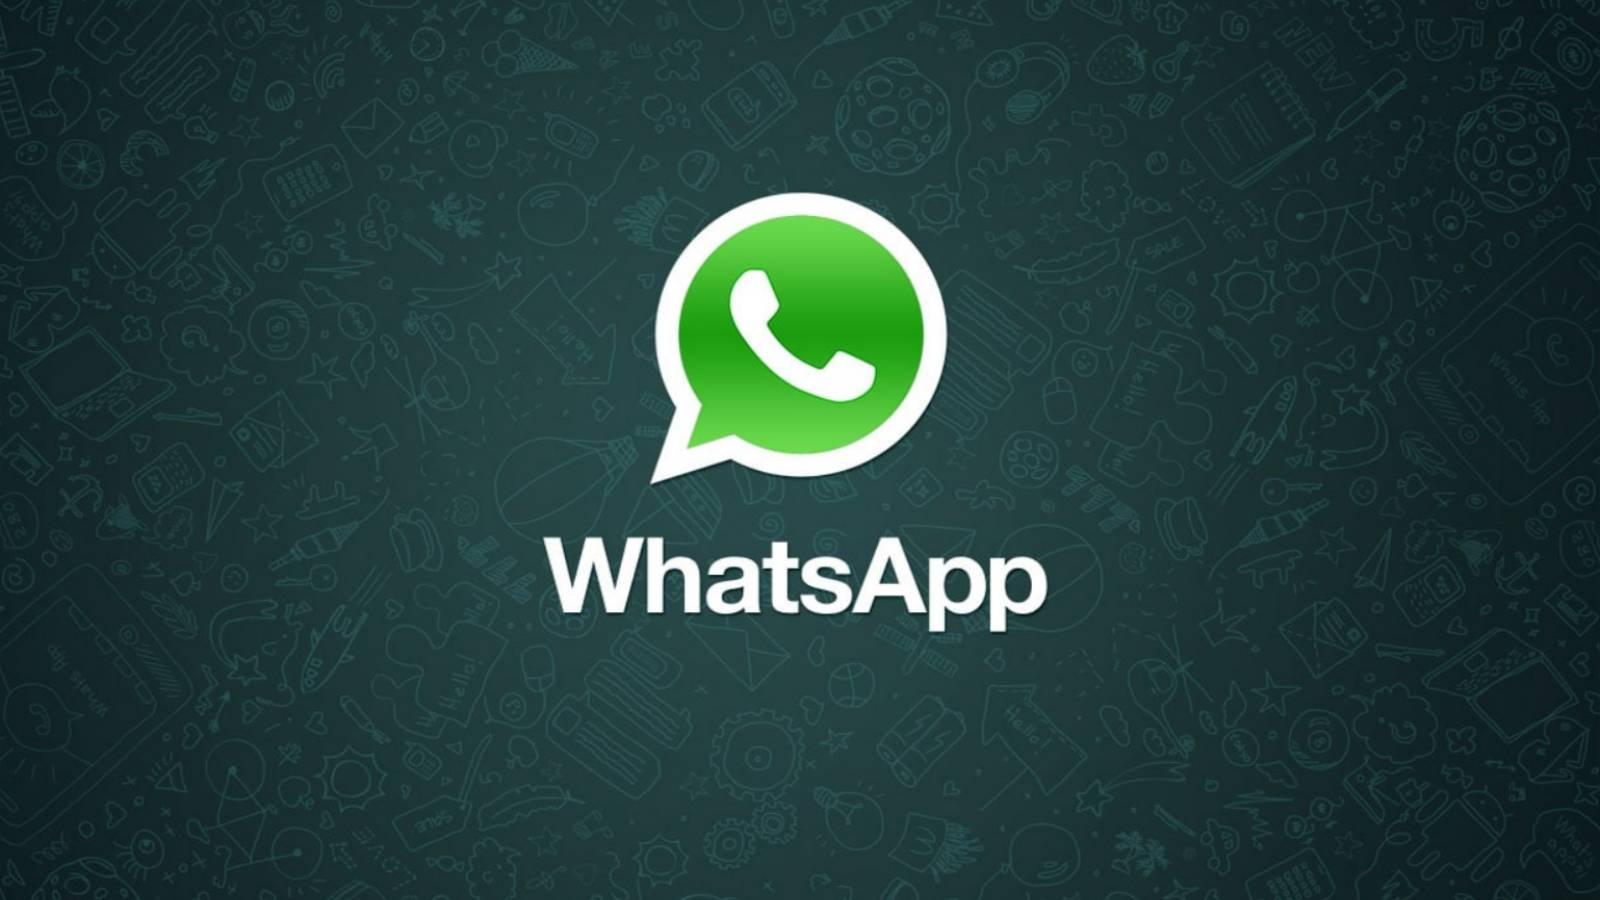 WhatsApp sheets